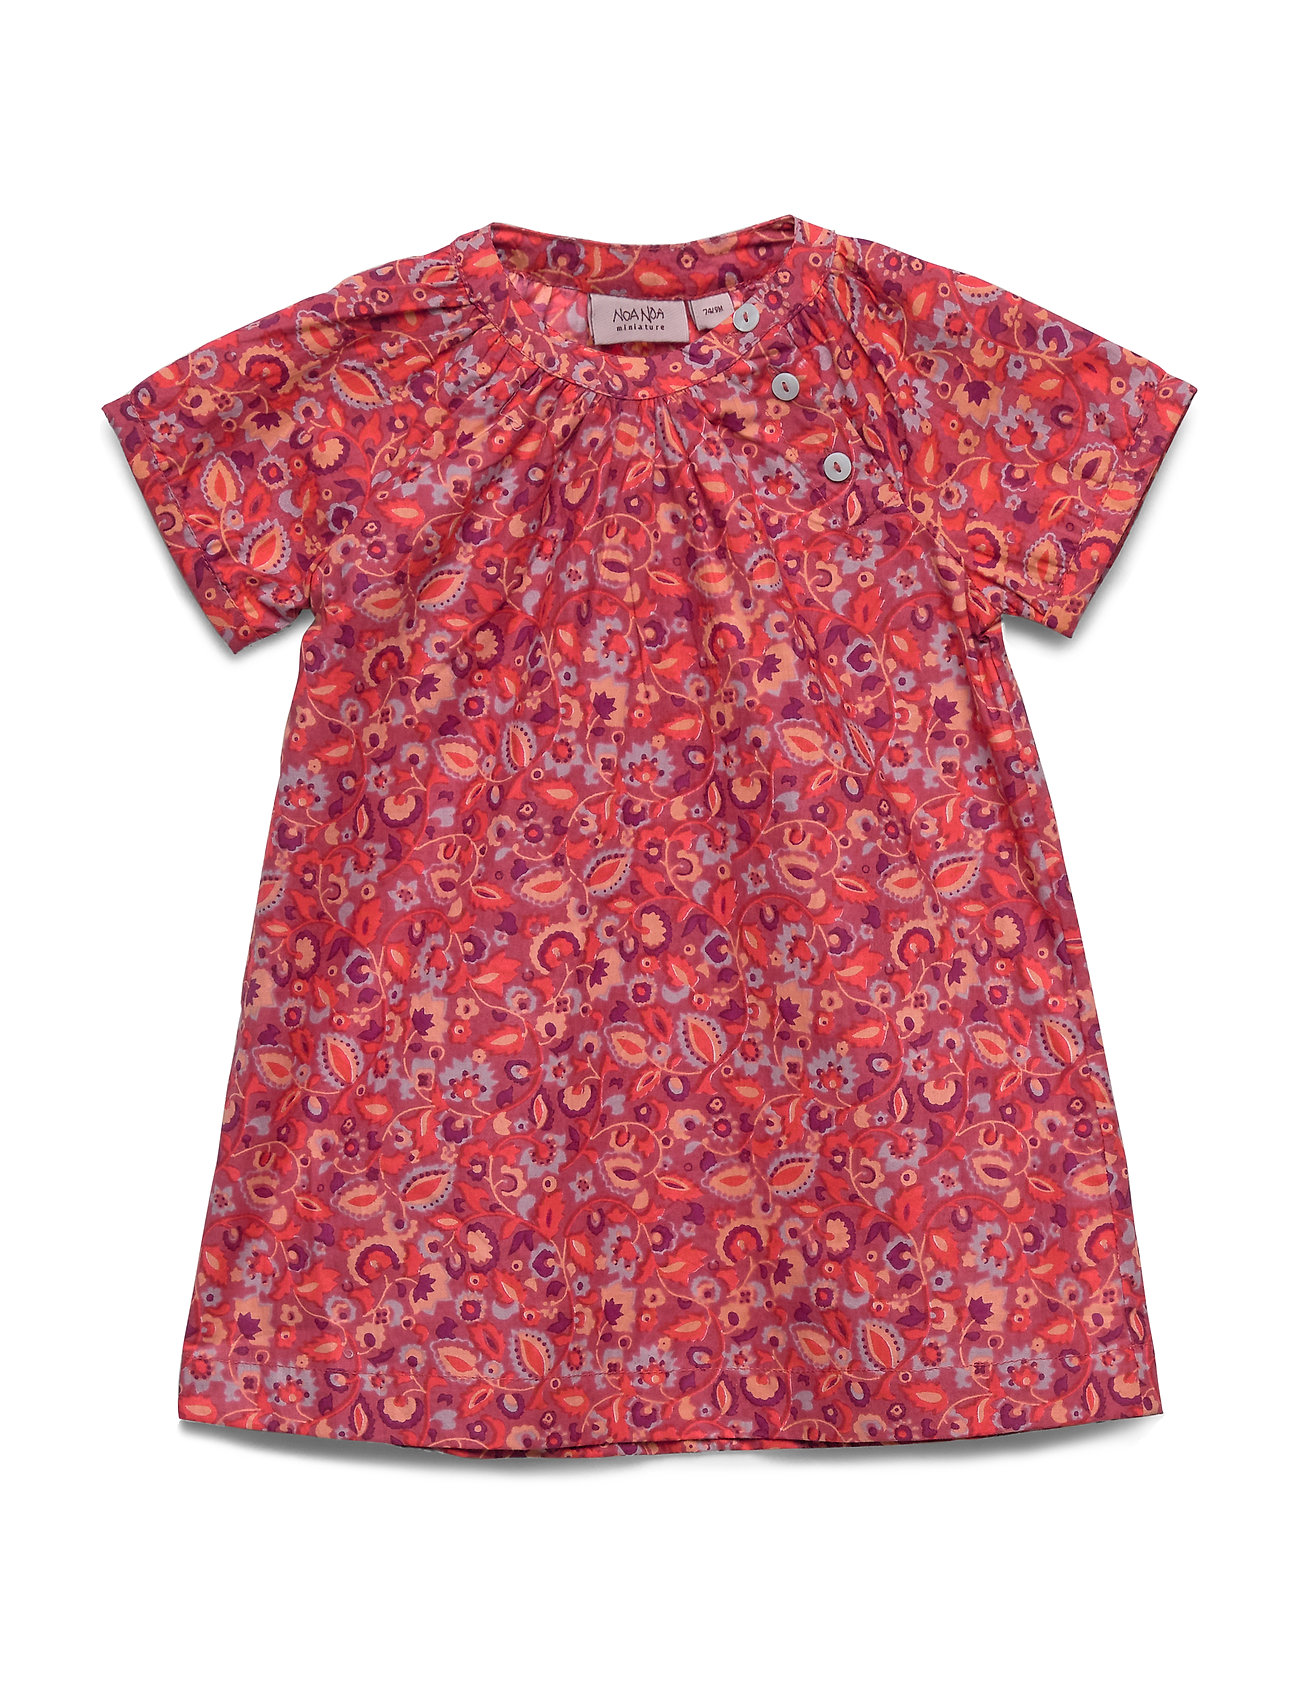 Noa Noa Miniature Dress short sleeve - BAROQUE ROSE